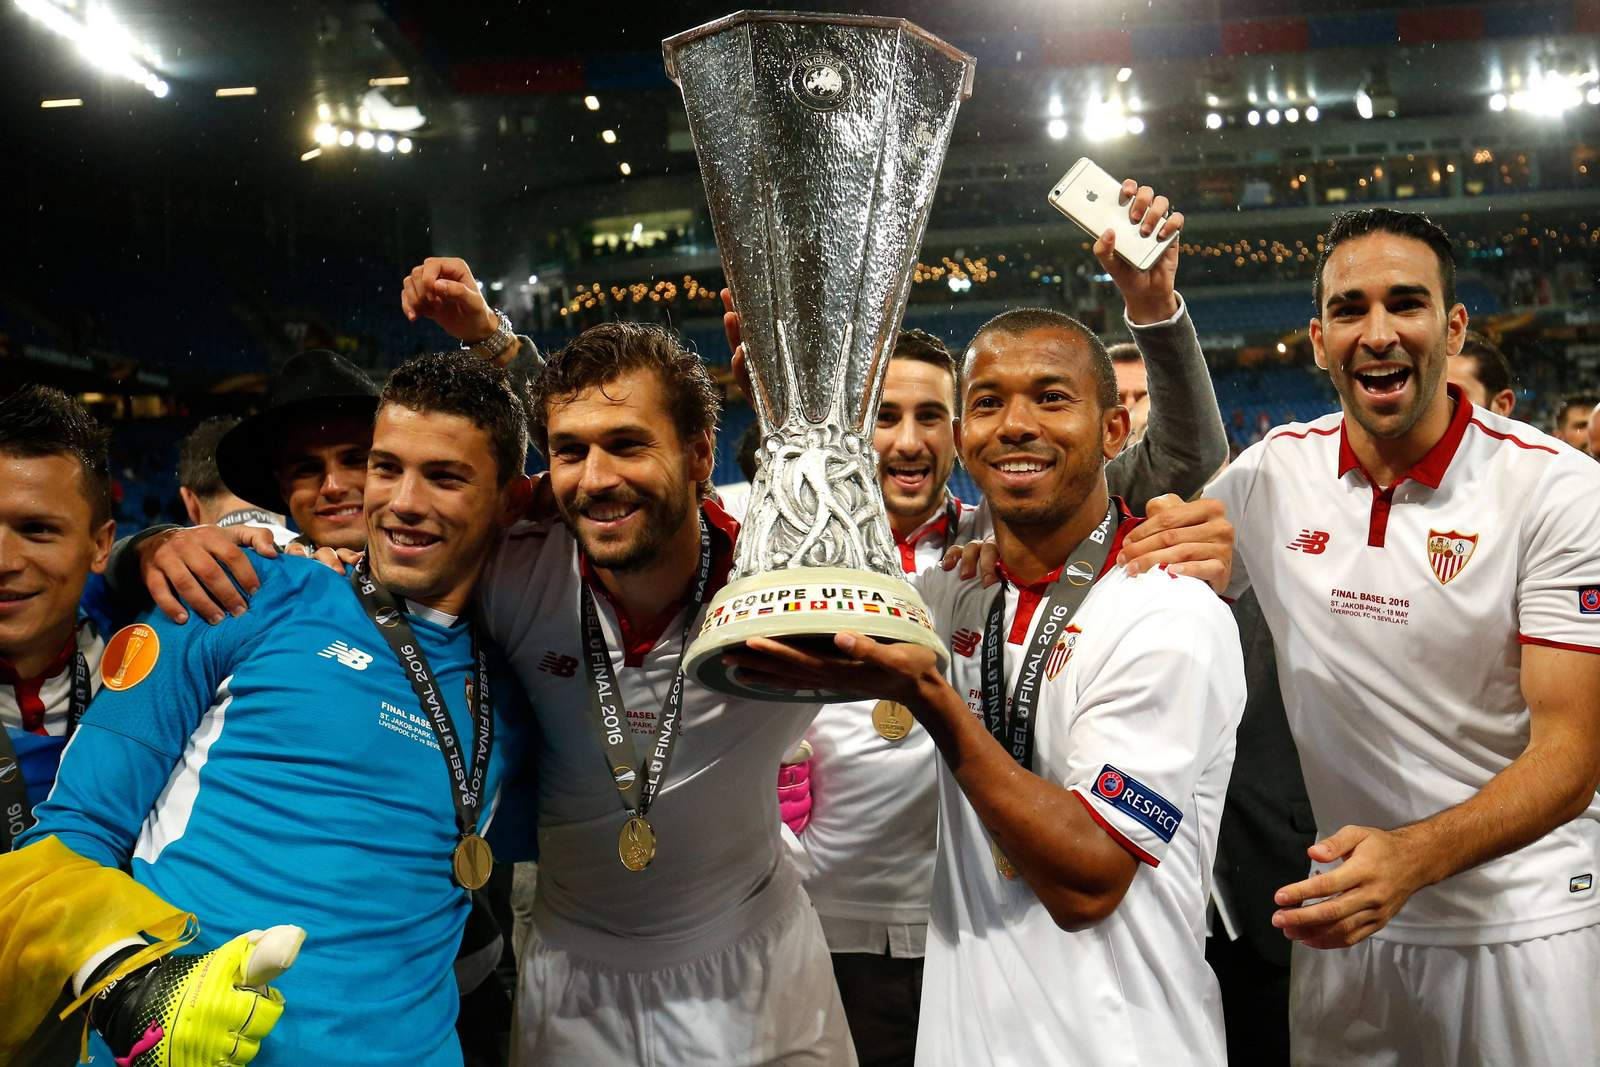 Wer holt den UEFA Pokal? Jetzt Europa League Wett Tipps sichern